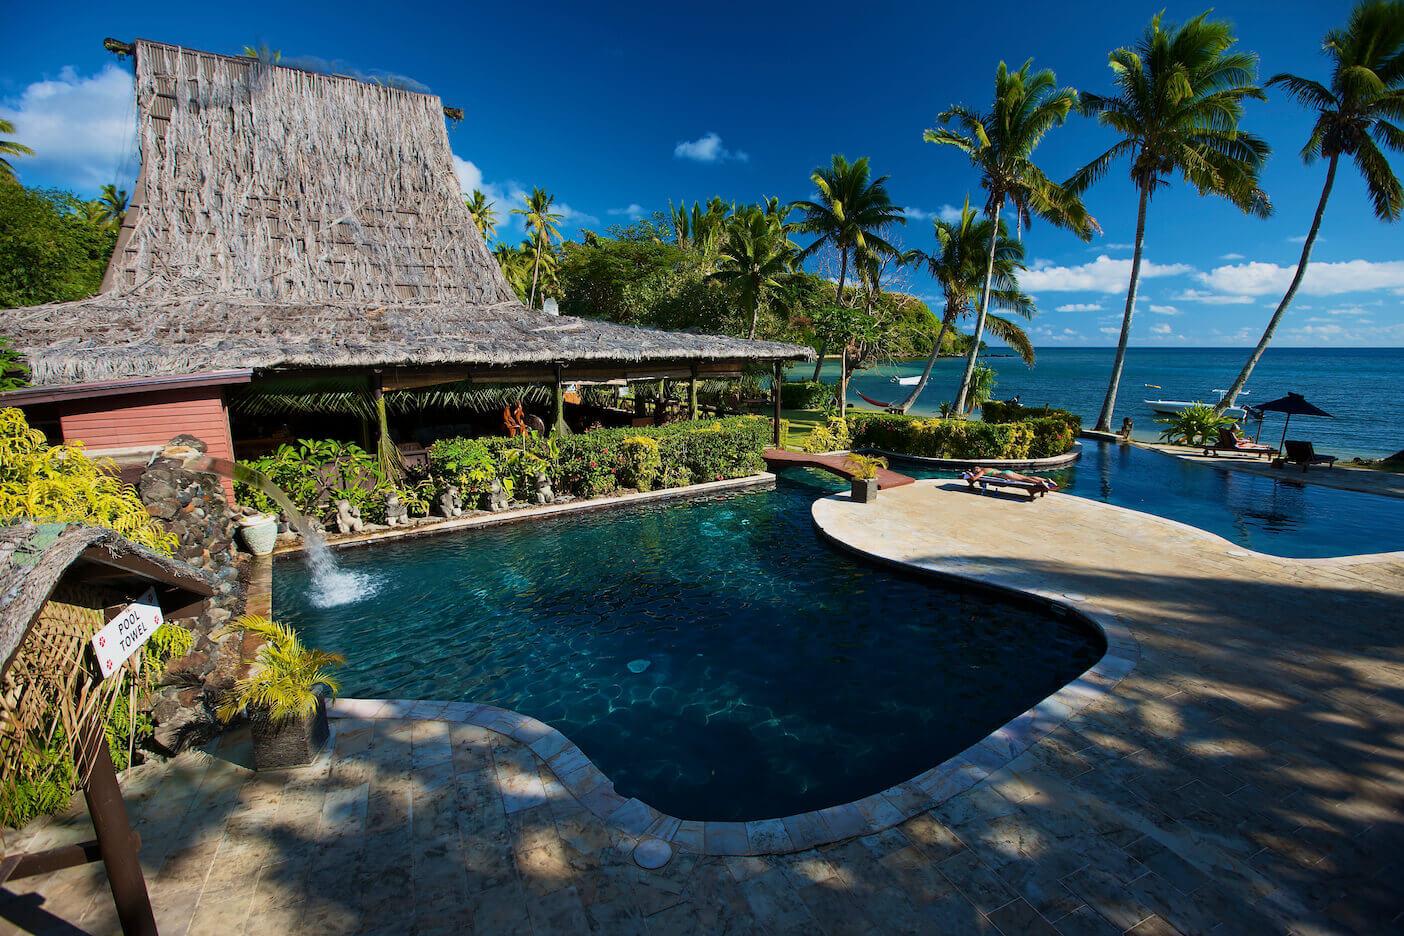 Beqa Lagoon, FIJI Trip October 2022